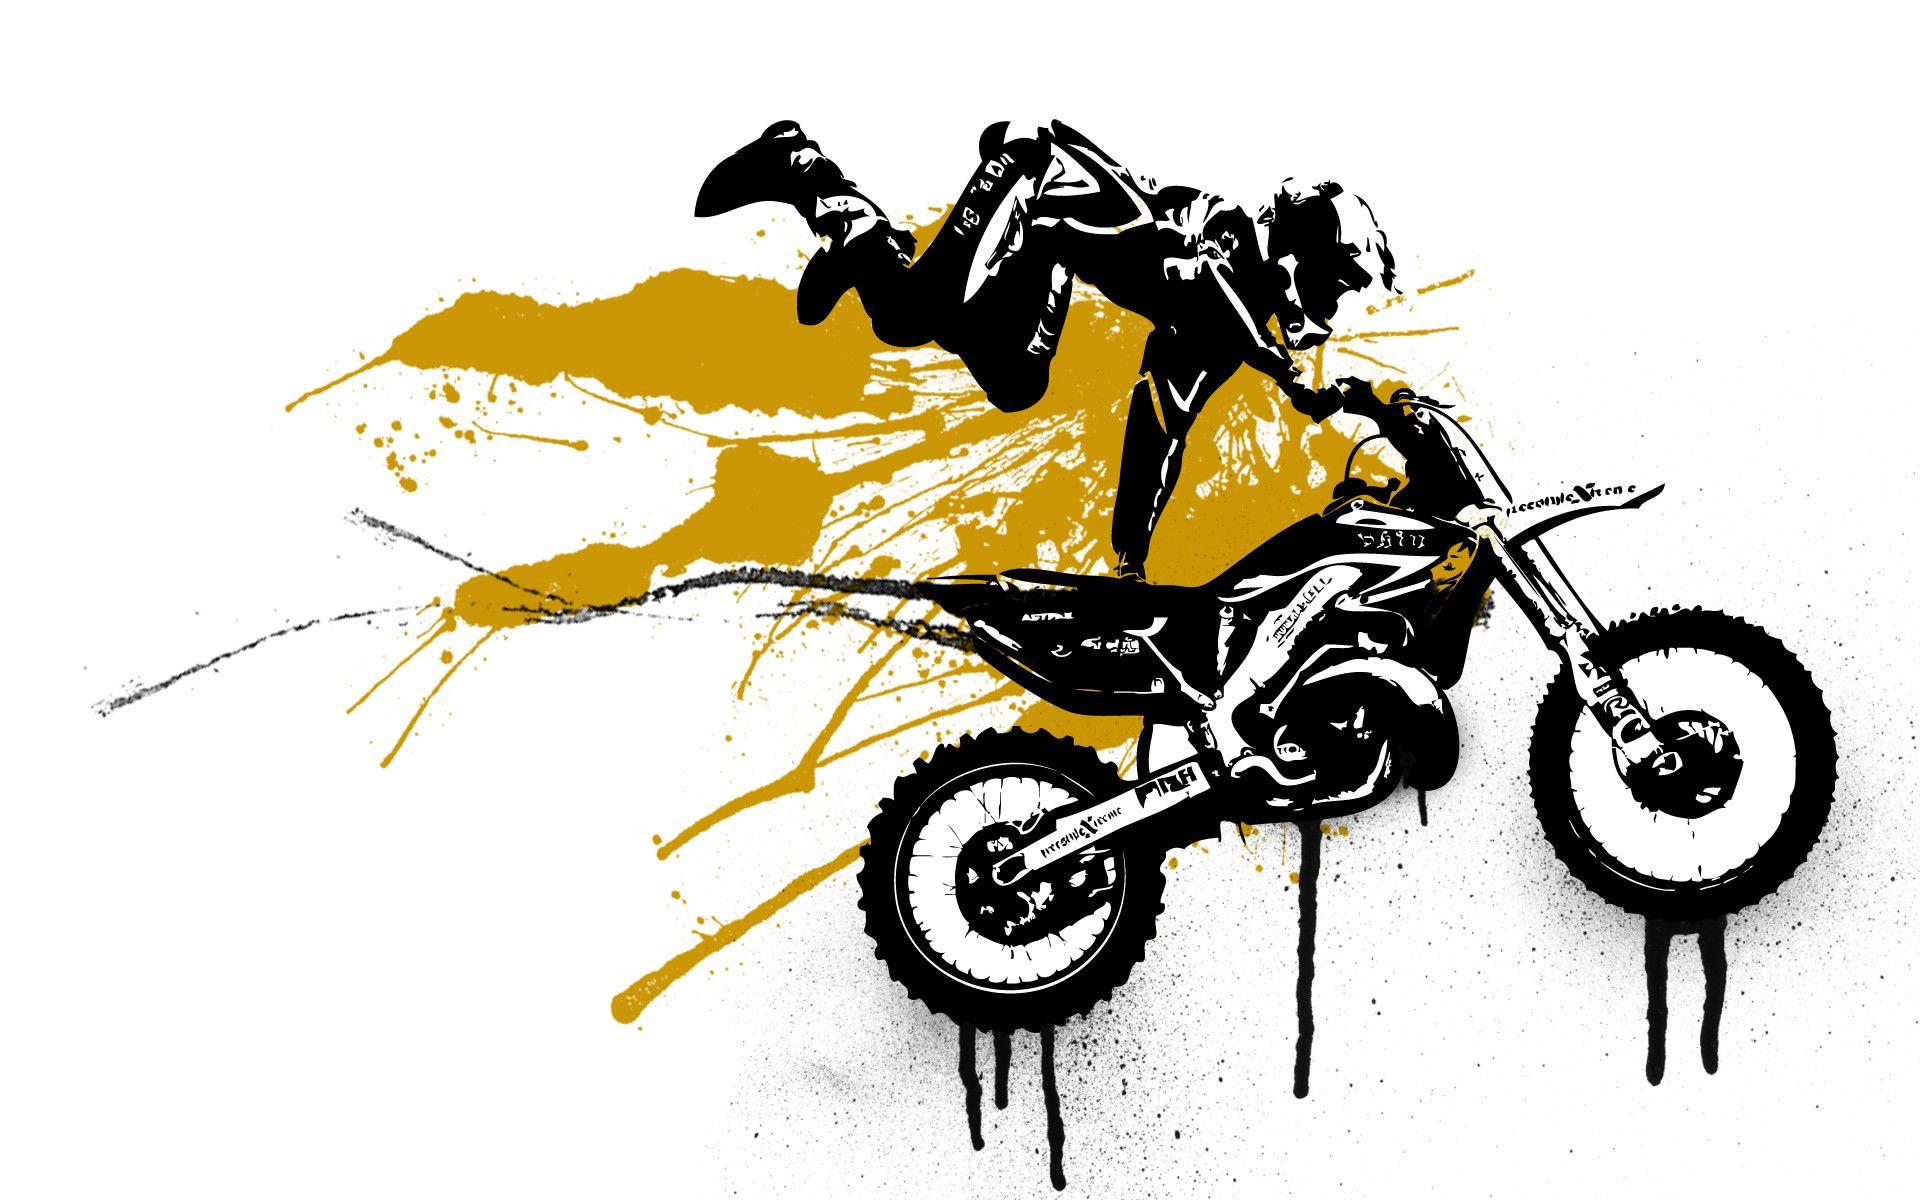 Ktm Motocross Wallpaper Hd Fond D 233 Cran De Motocross